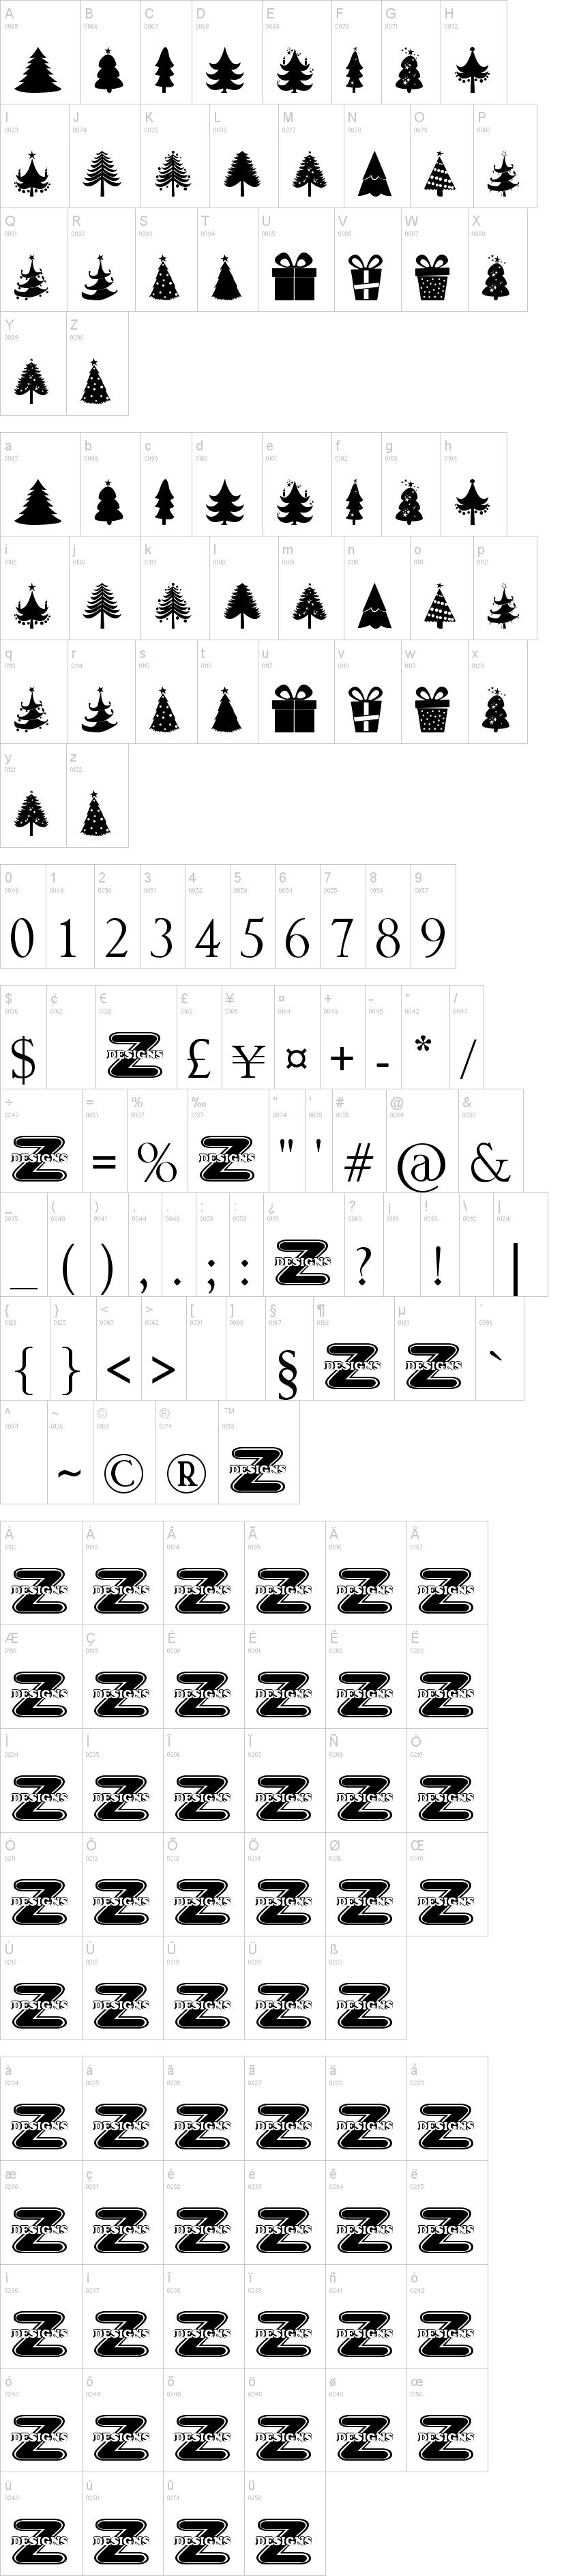 Xmas Tree Schriftarten Plotten